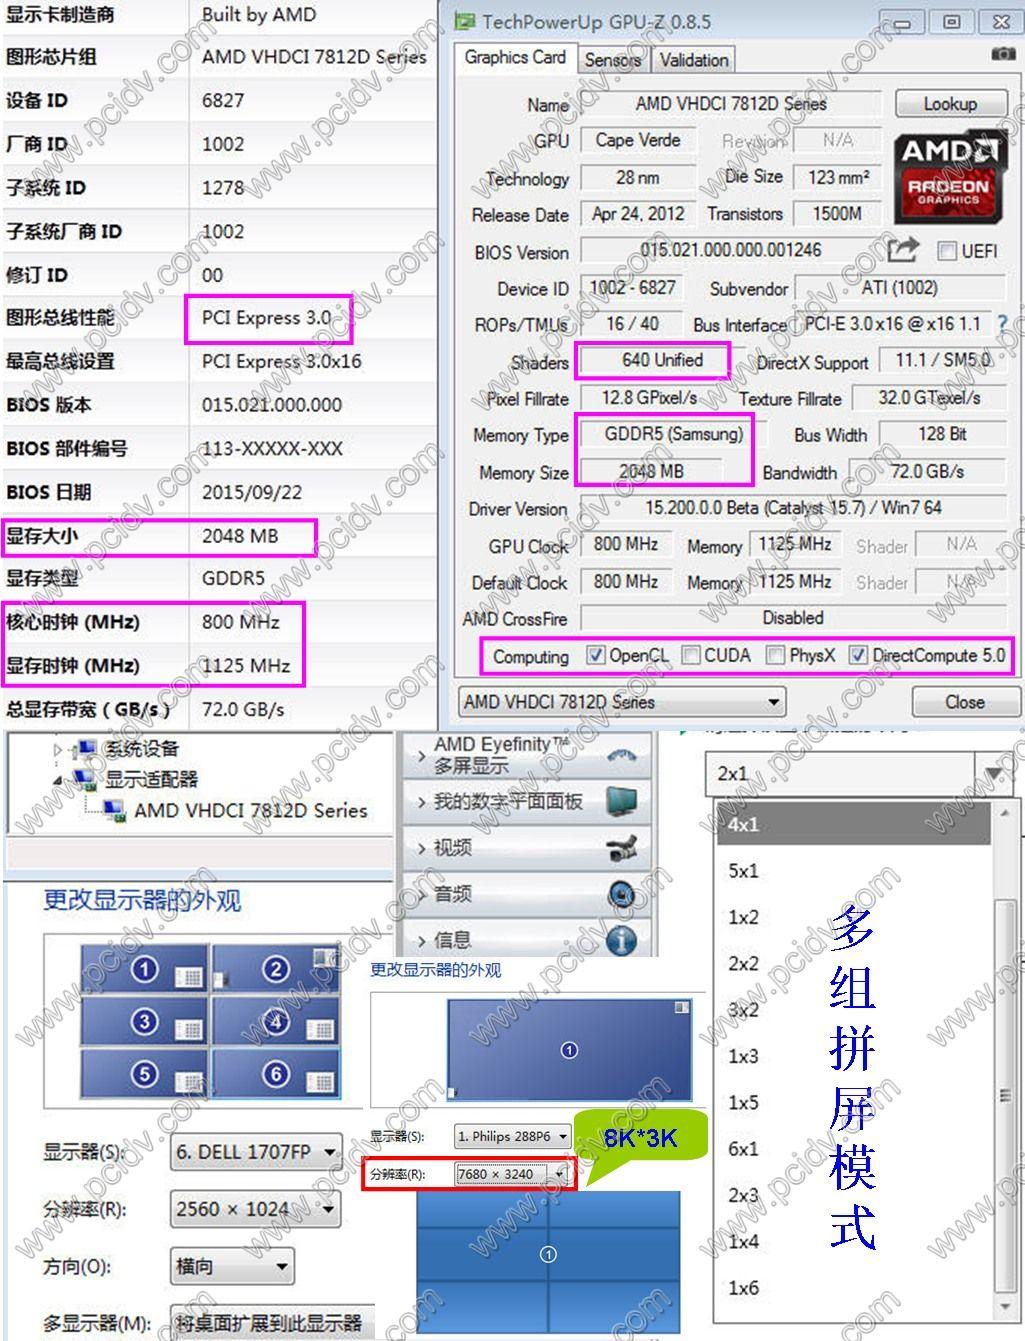 pcidv.com/拼接屏12屏显卡VHDCI 7812D硬件参数及组屏模式